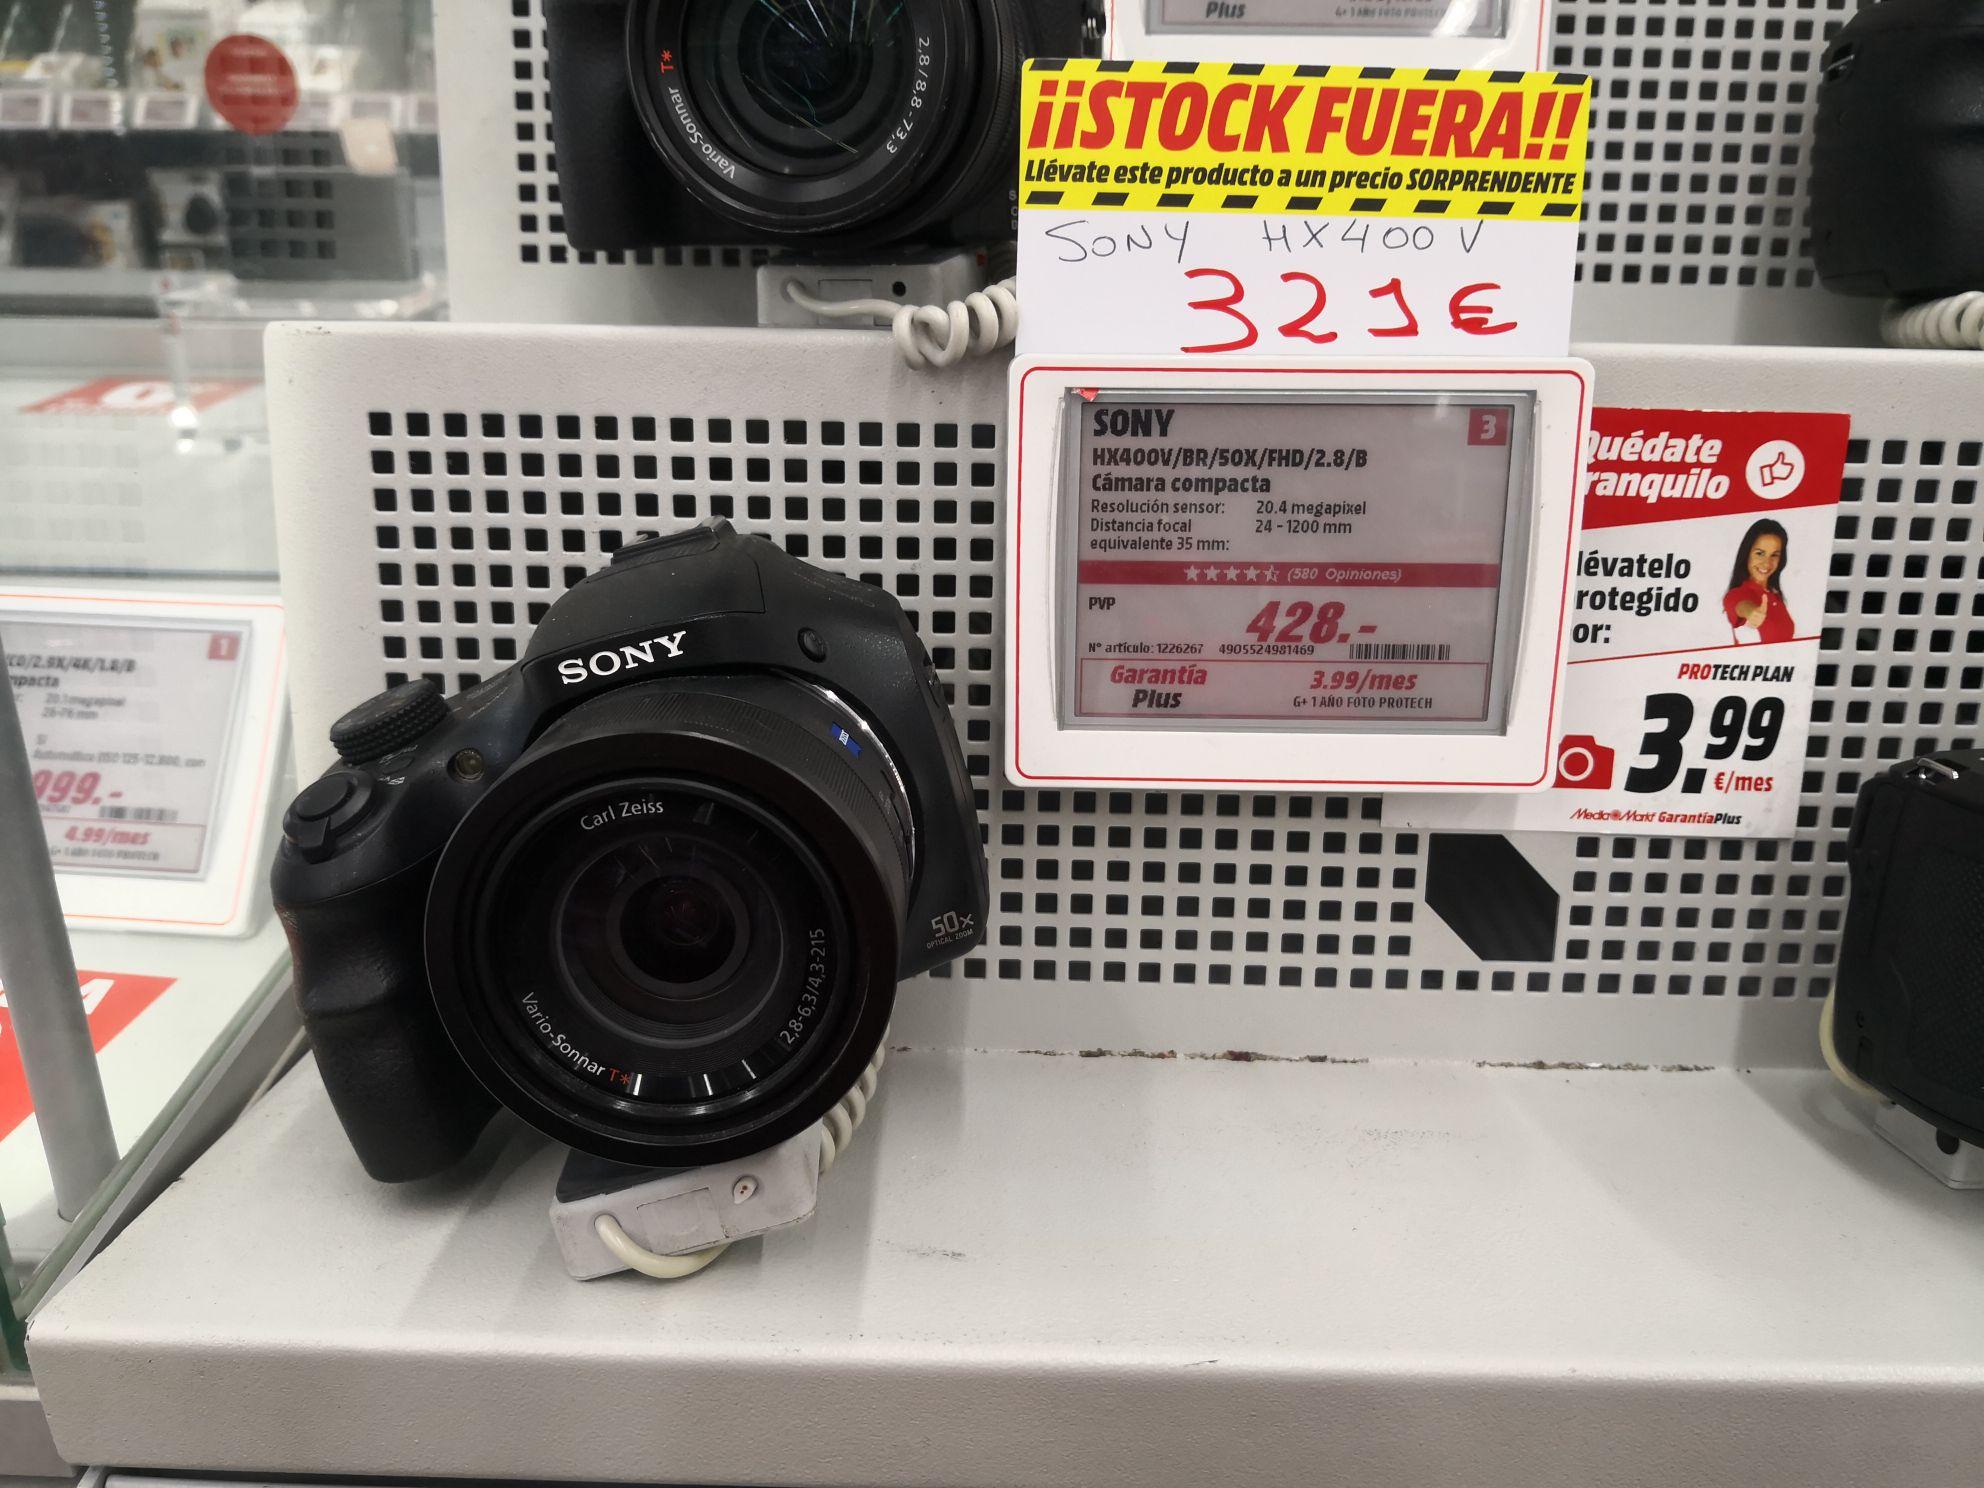 Cámara compacta Sony DSC-HX400V de 20,4 MP